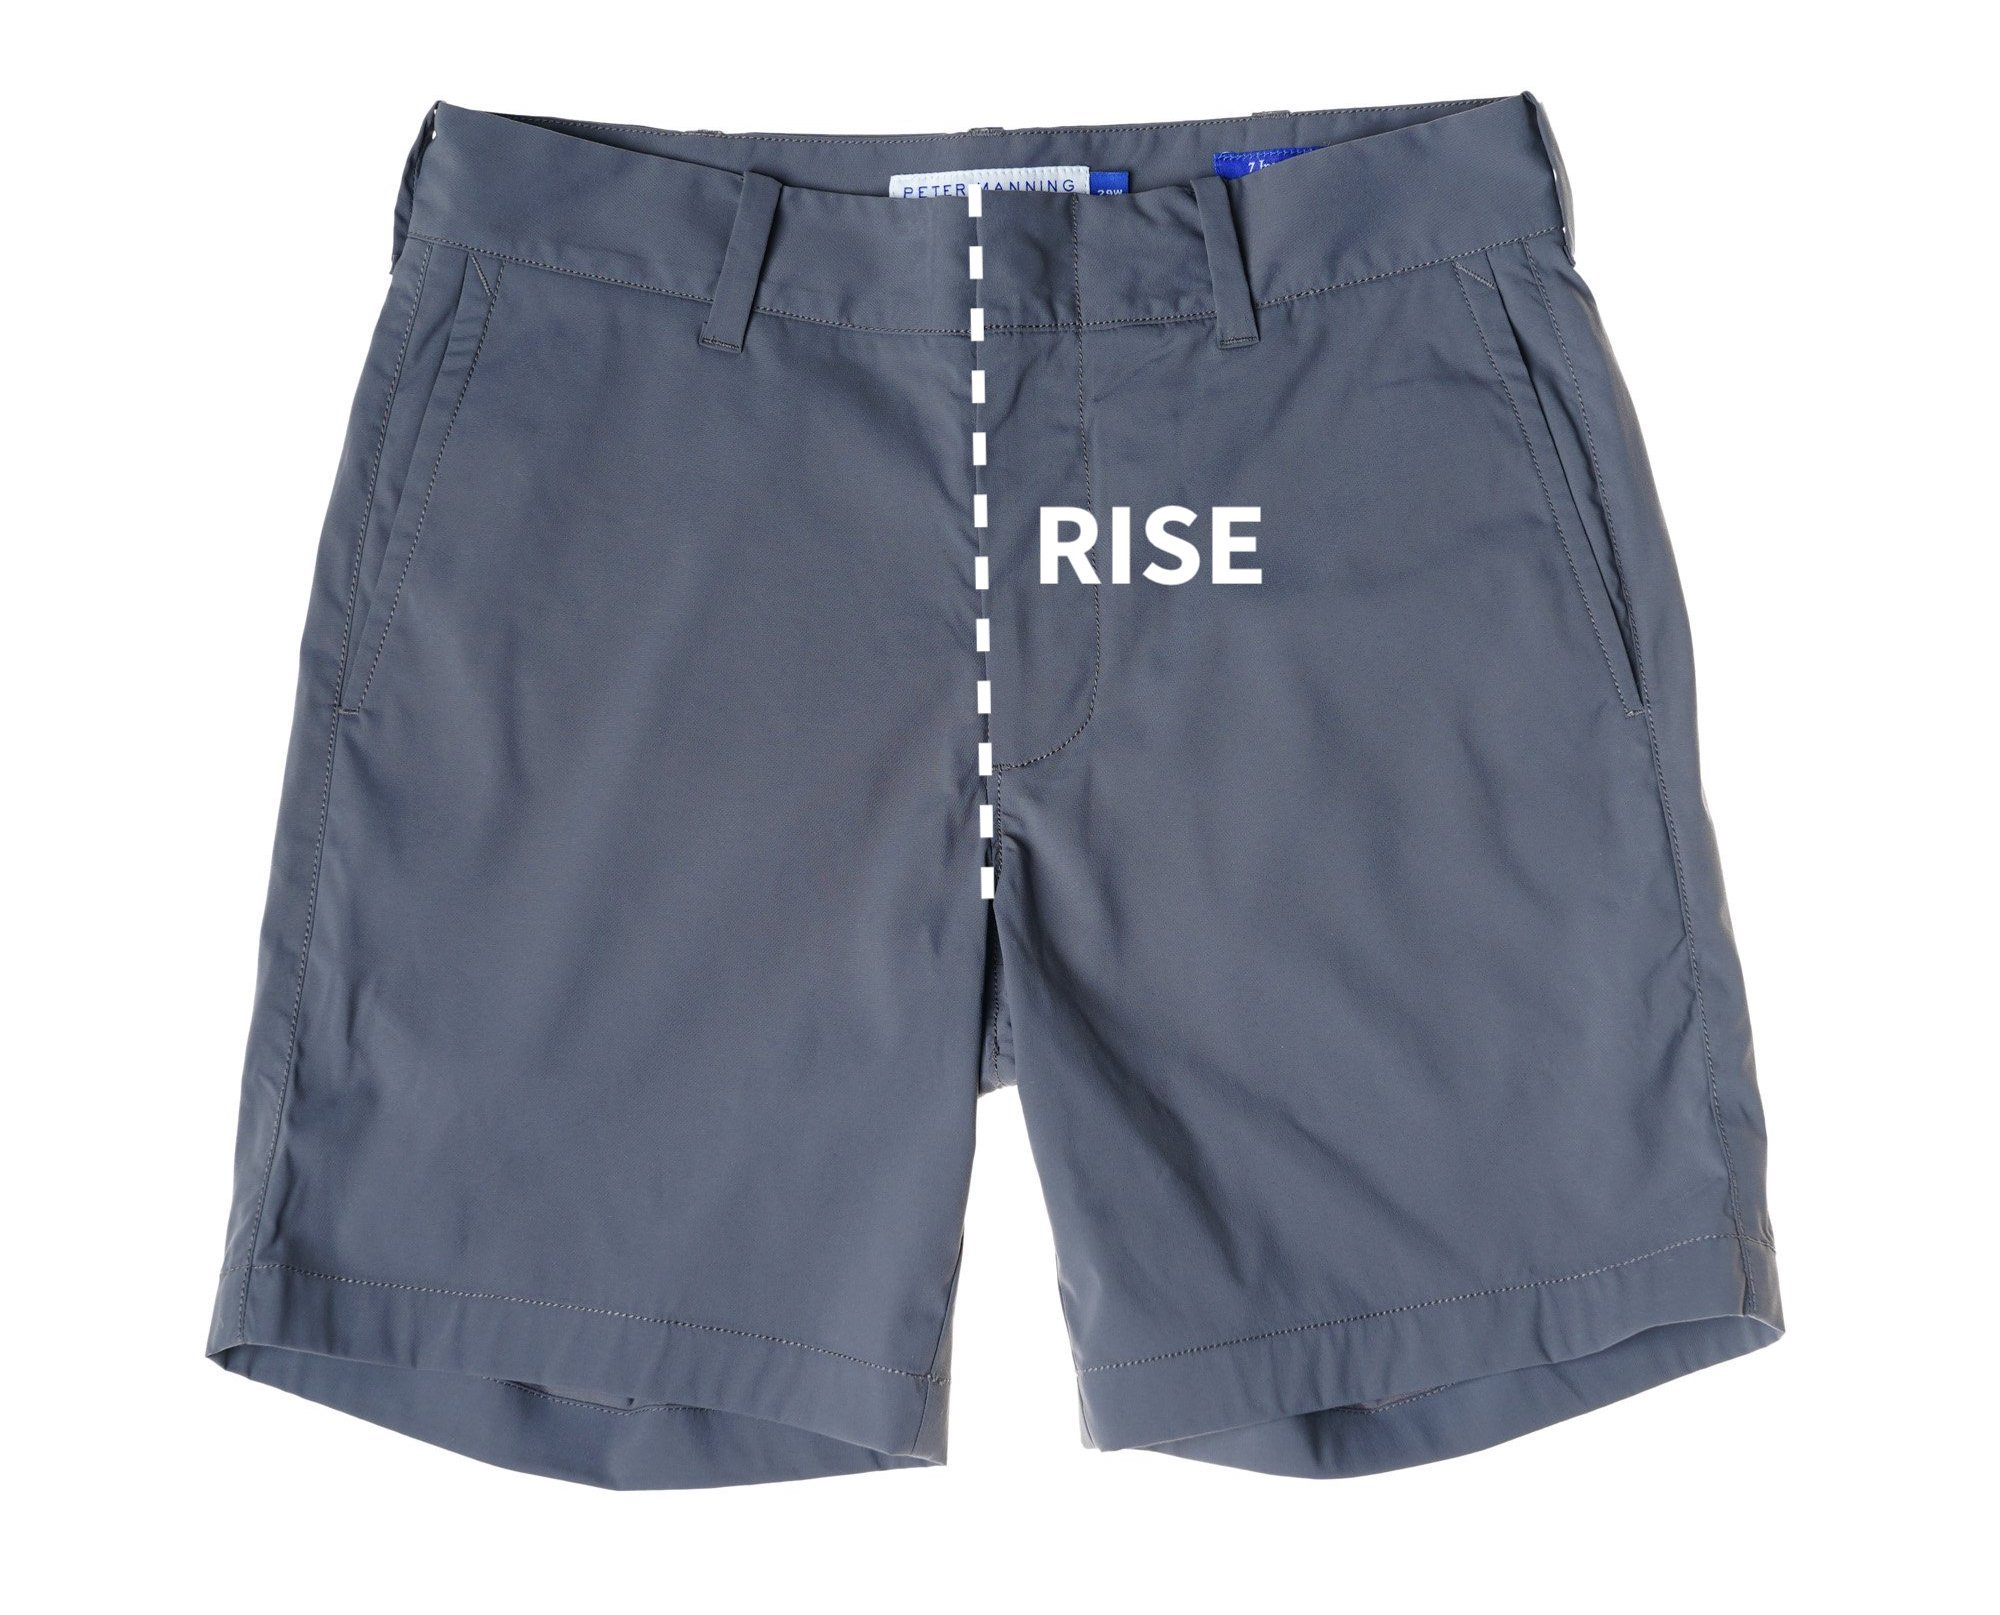 Shorts_rise.jpeg